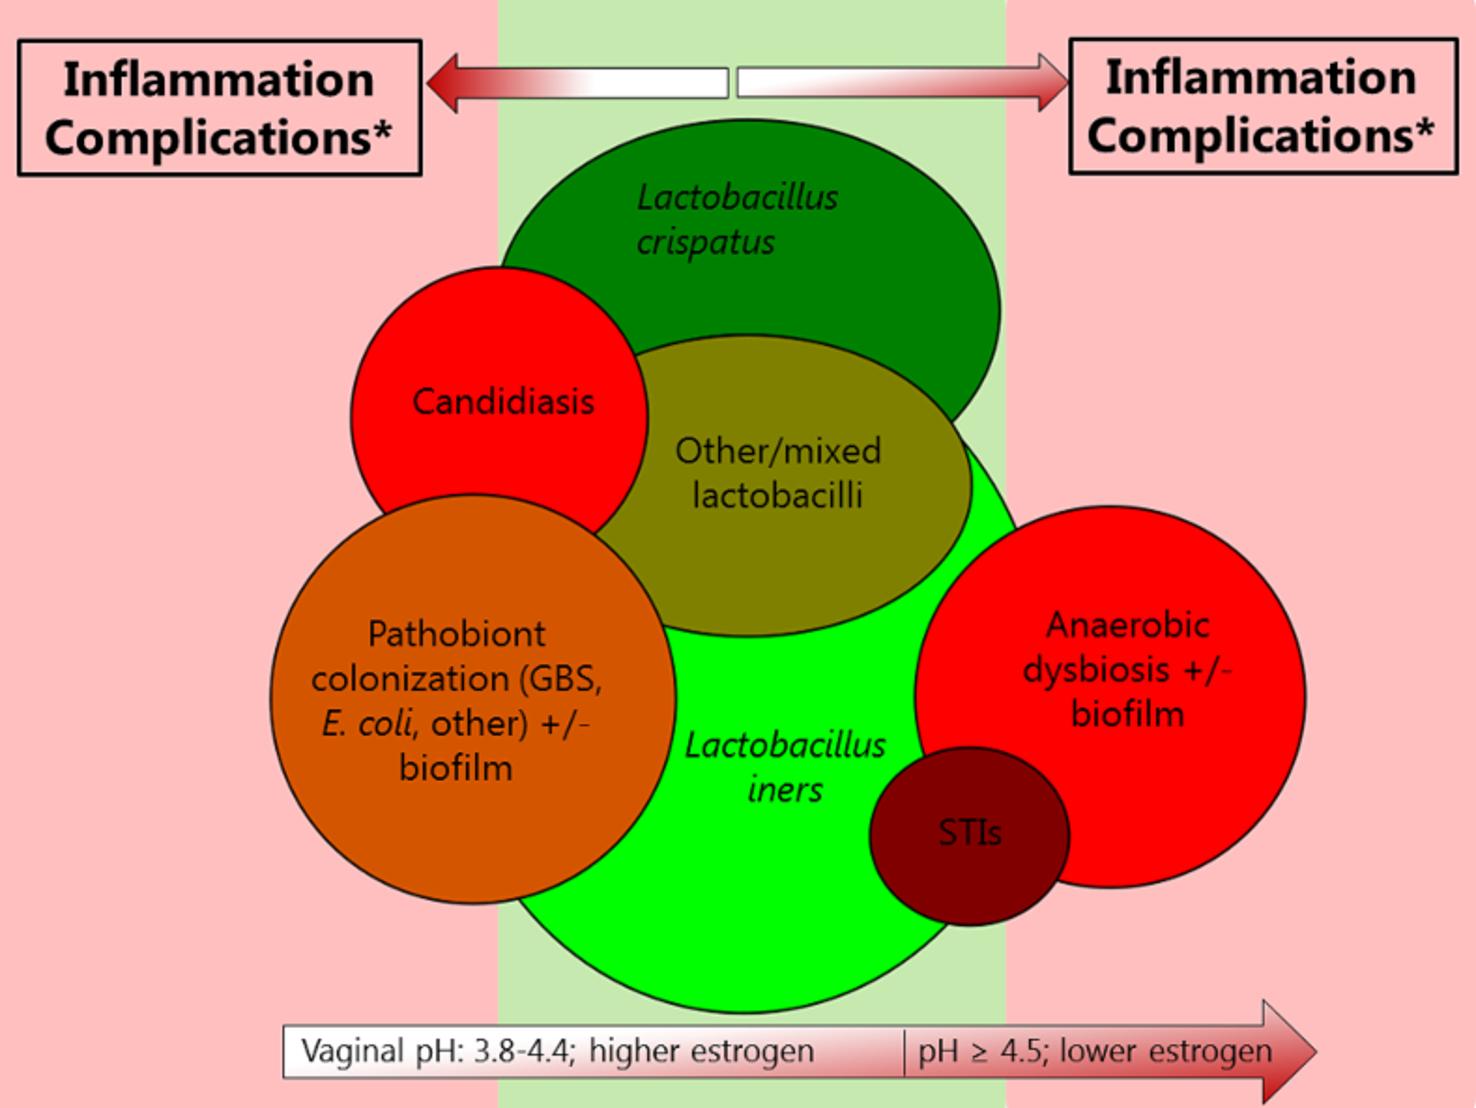 Visualization of interrelationships among various urogenital conditions involving micro-organisms.